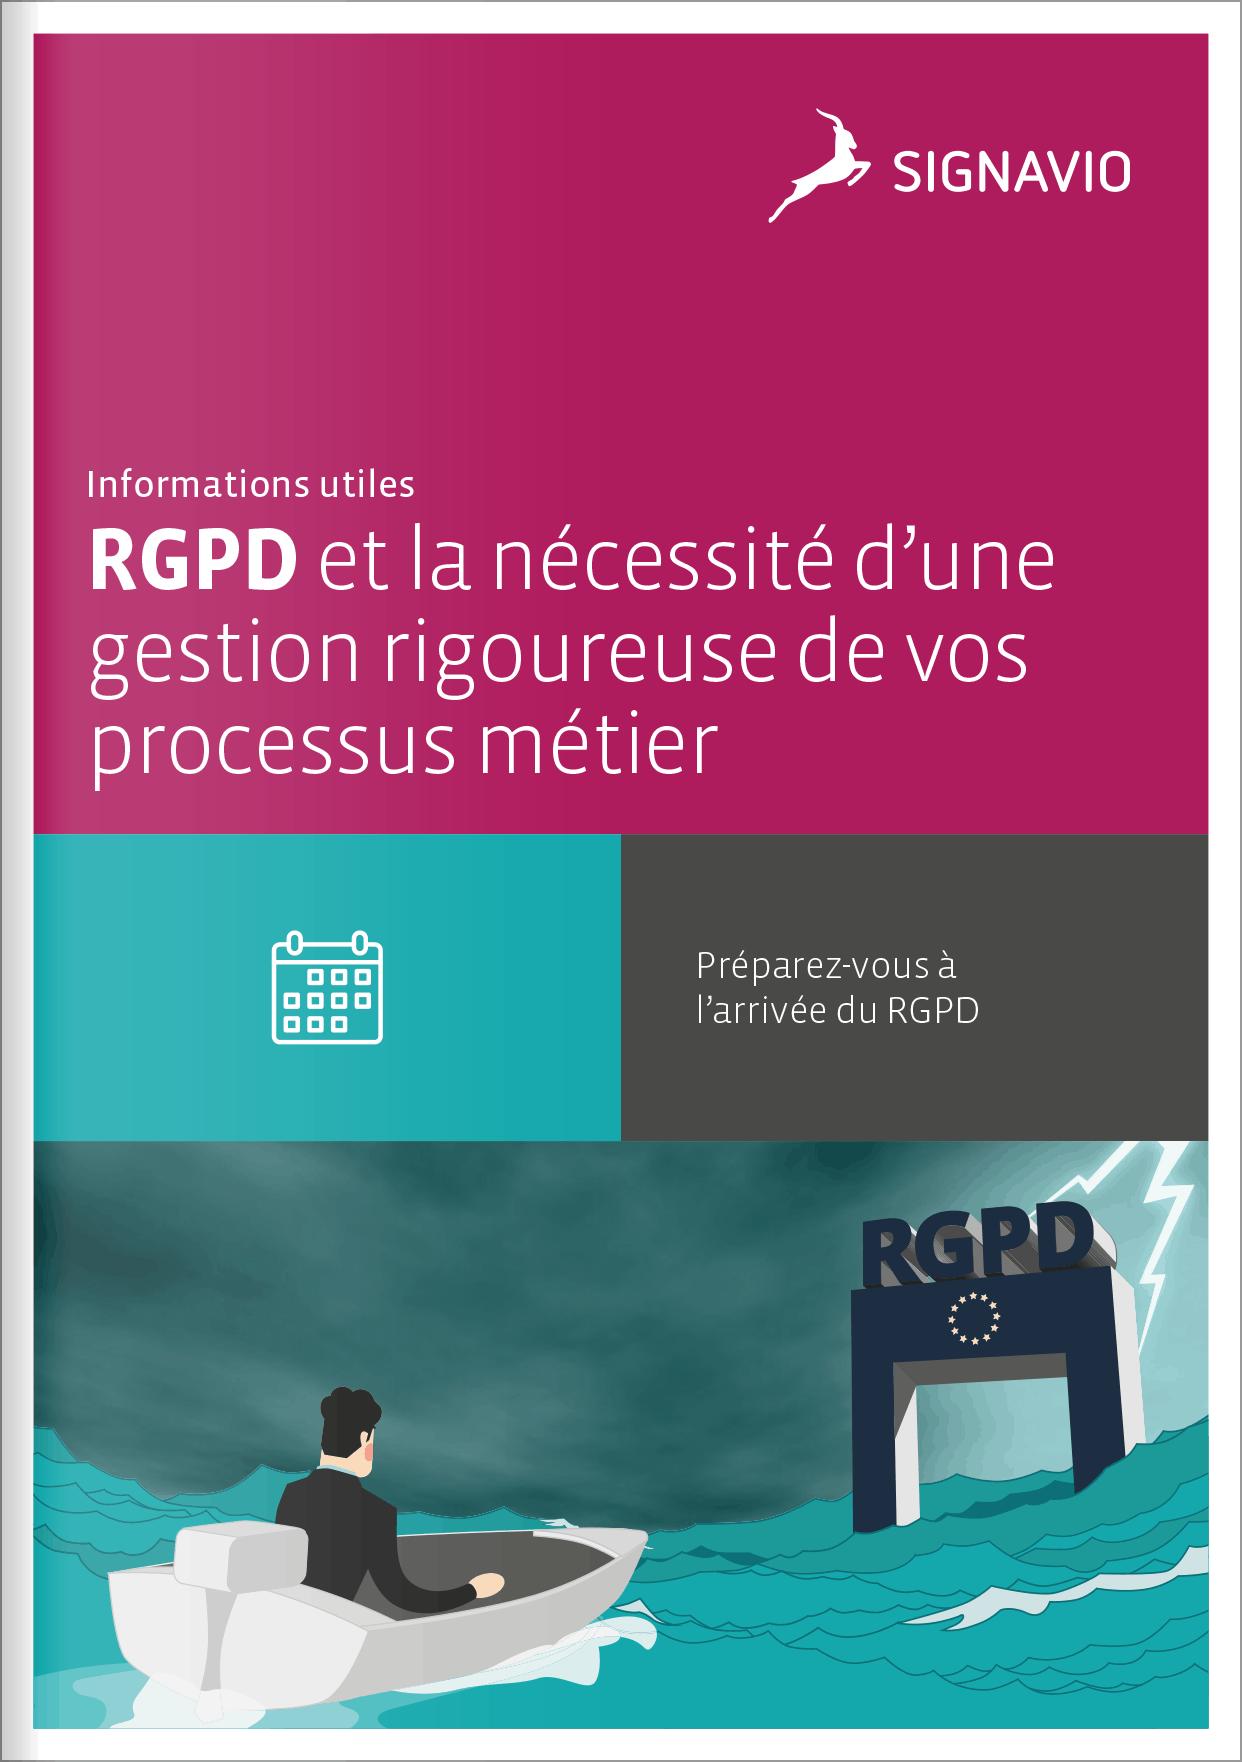 signavio-gdpr-fr